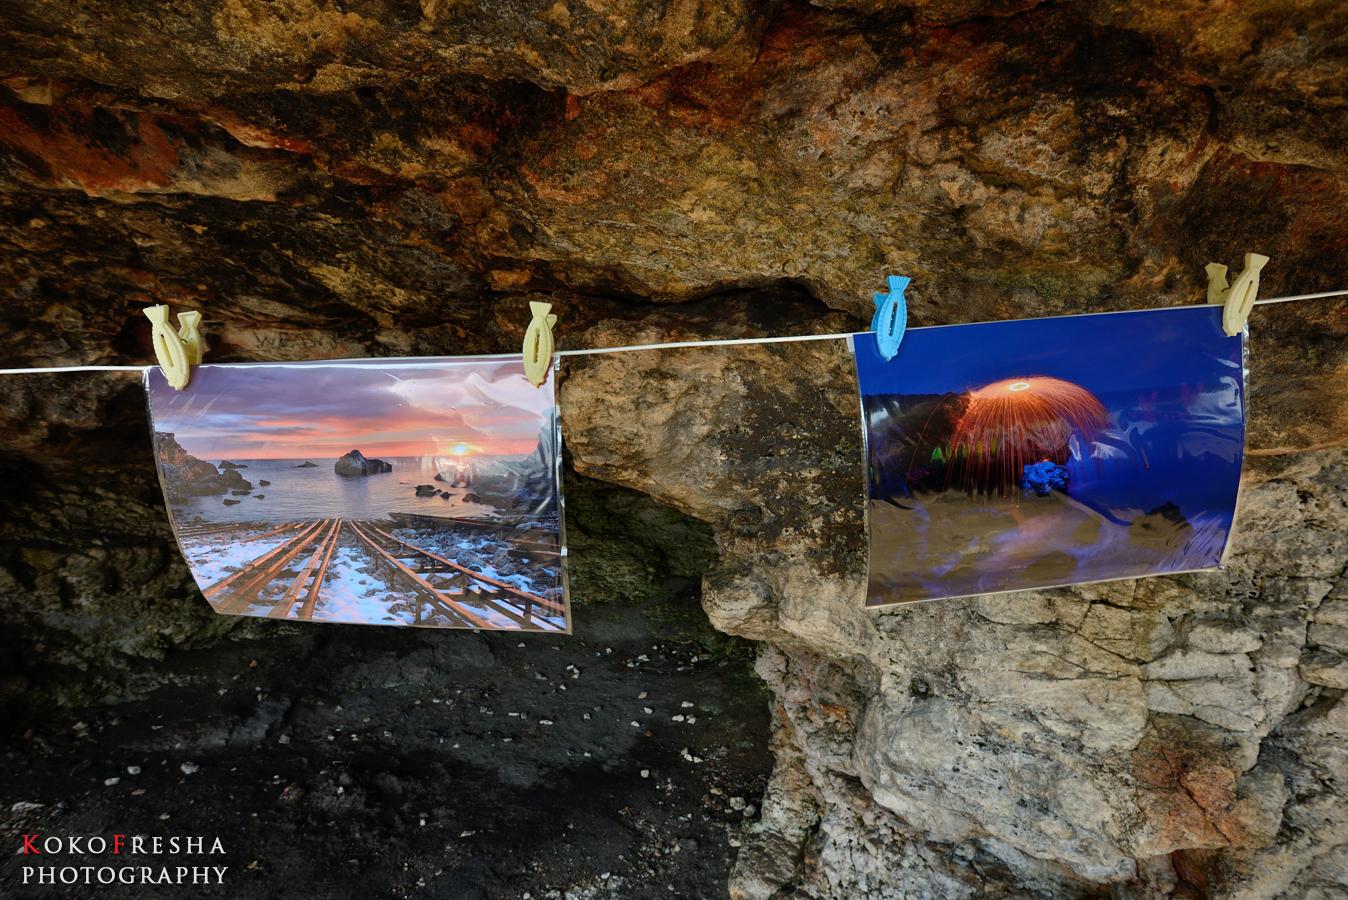 изложба в пещера - моето участие